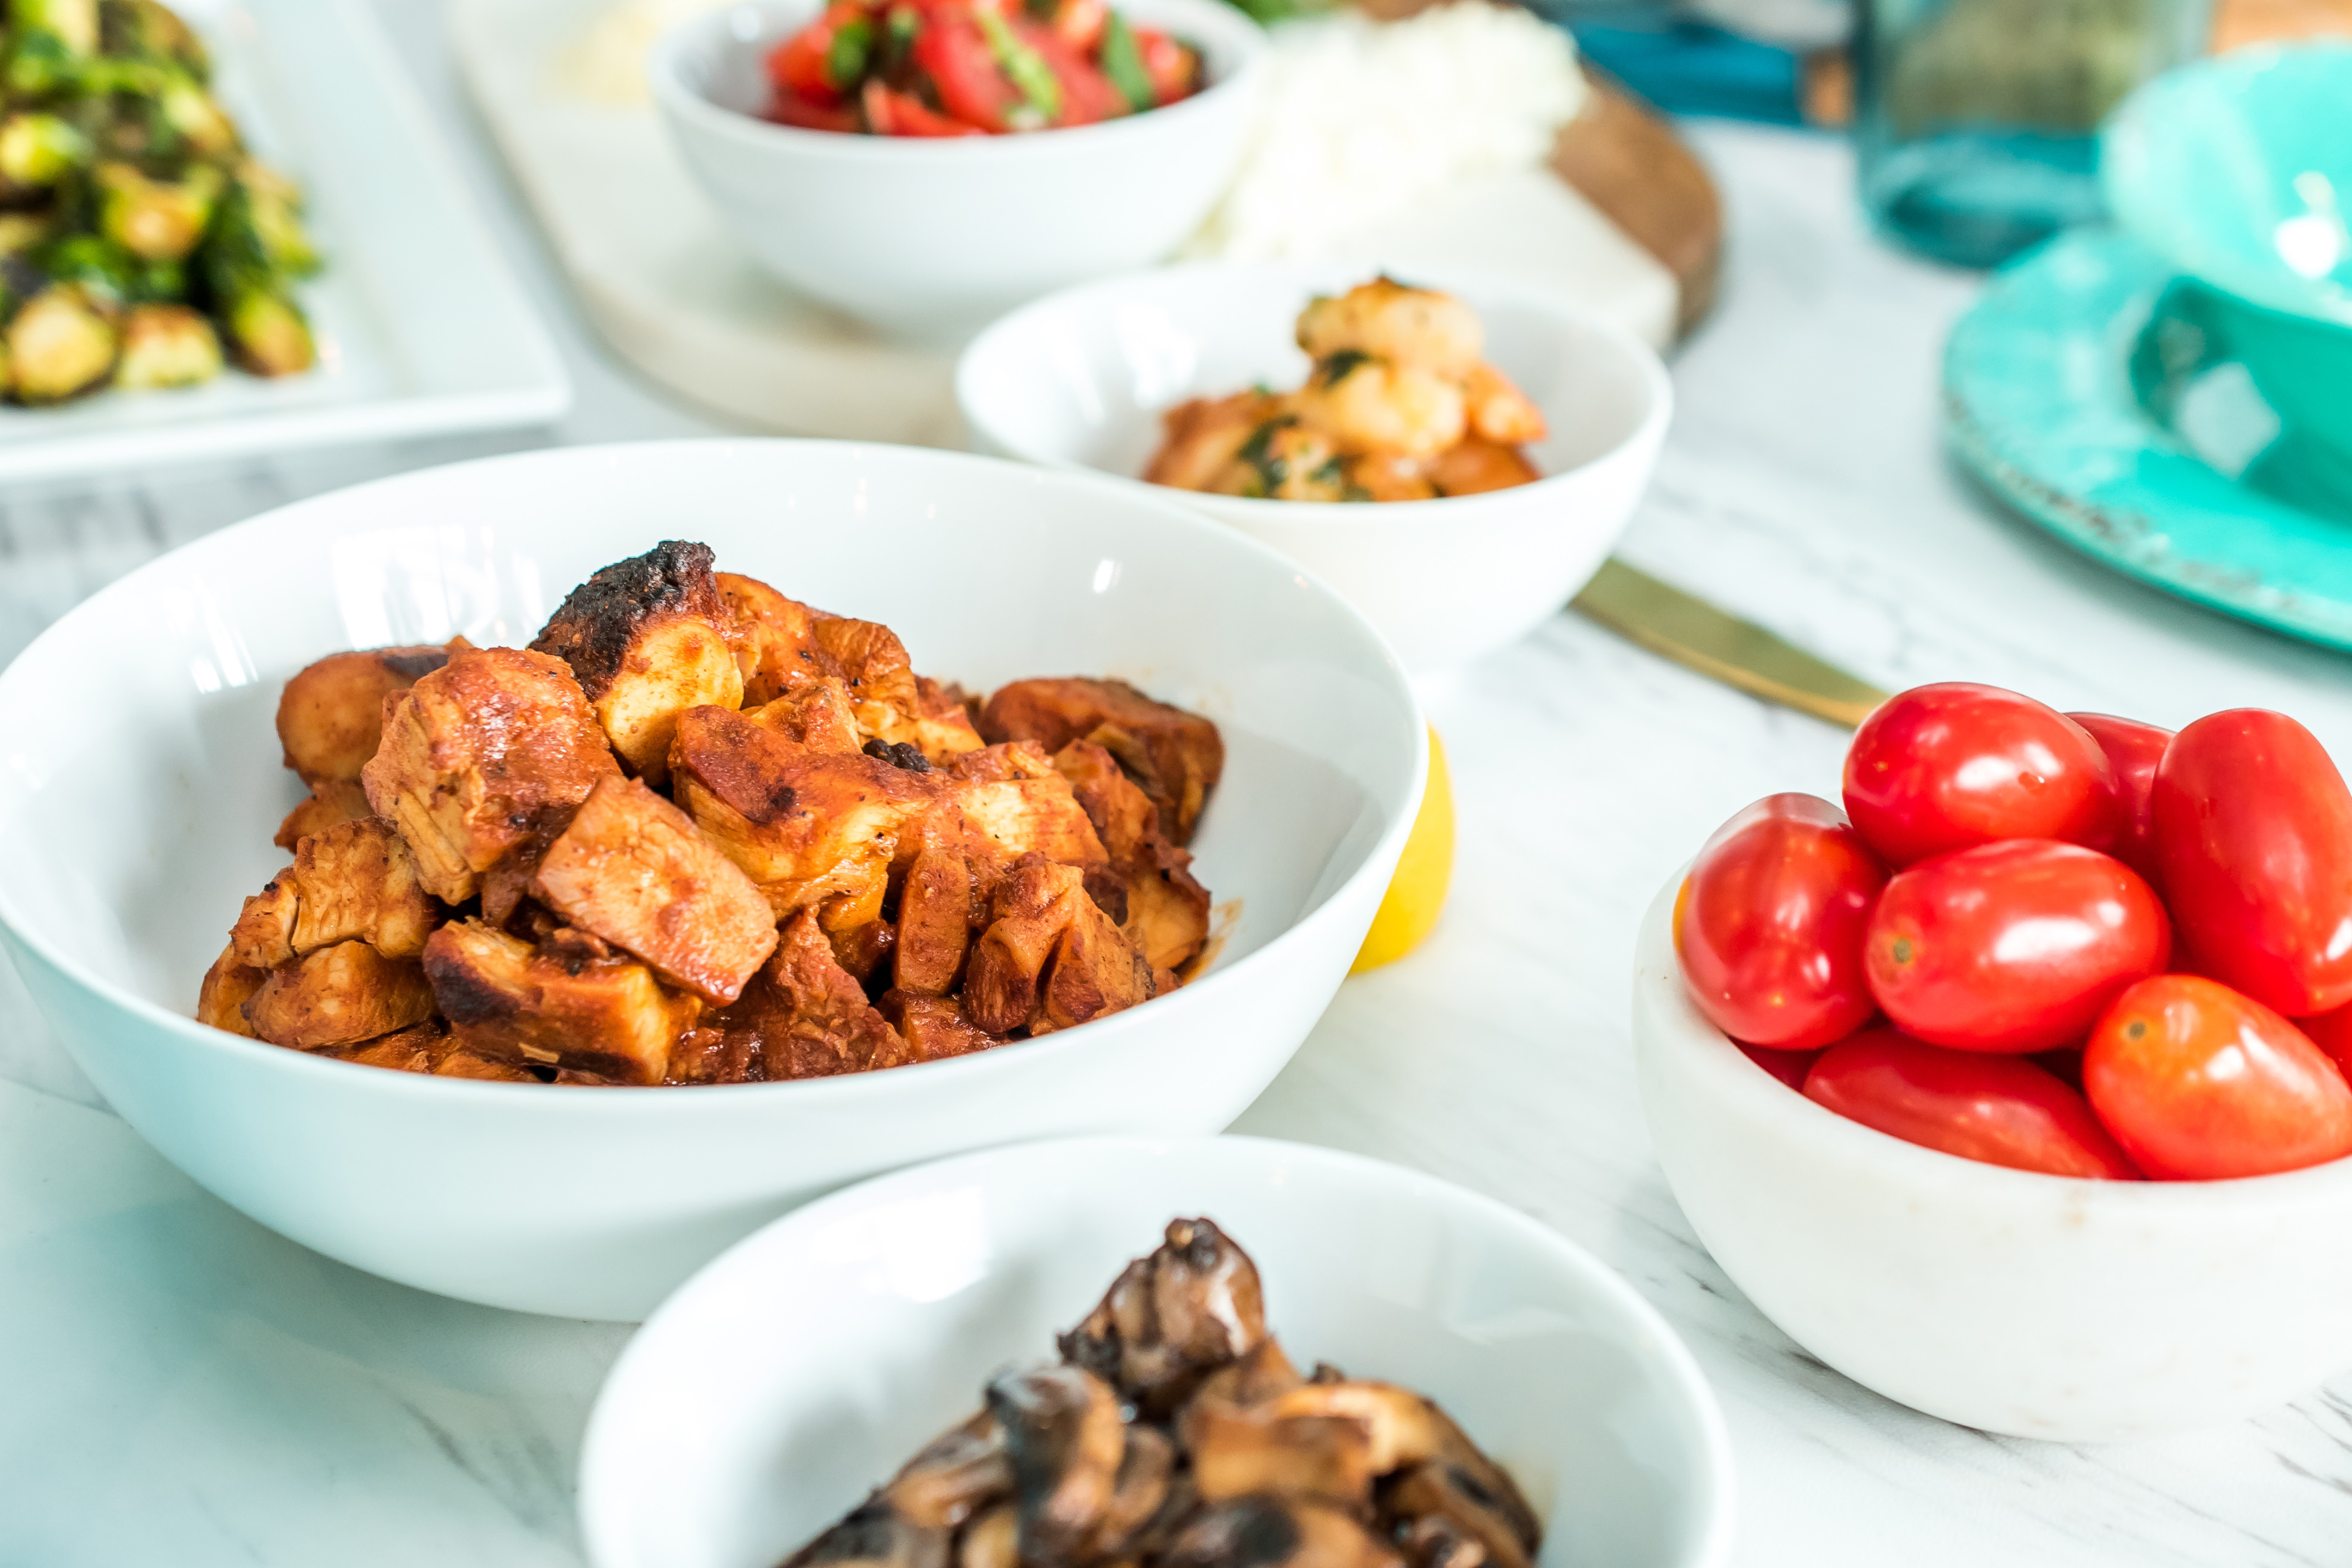 Where is good healthy restaurant jupiter fl?